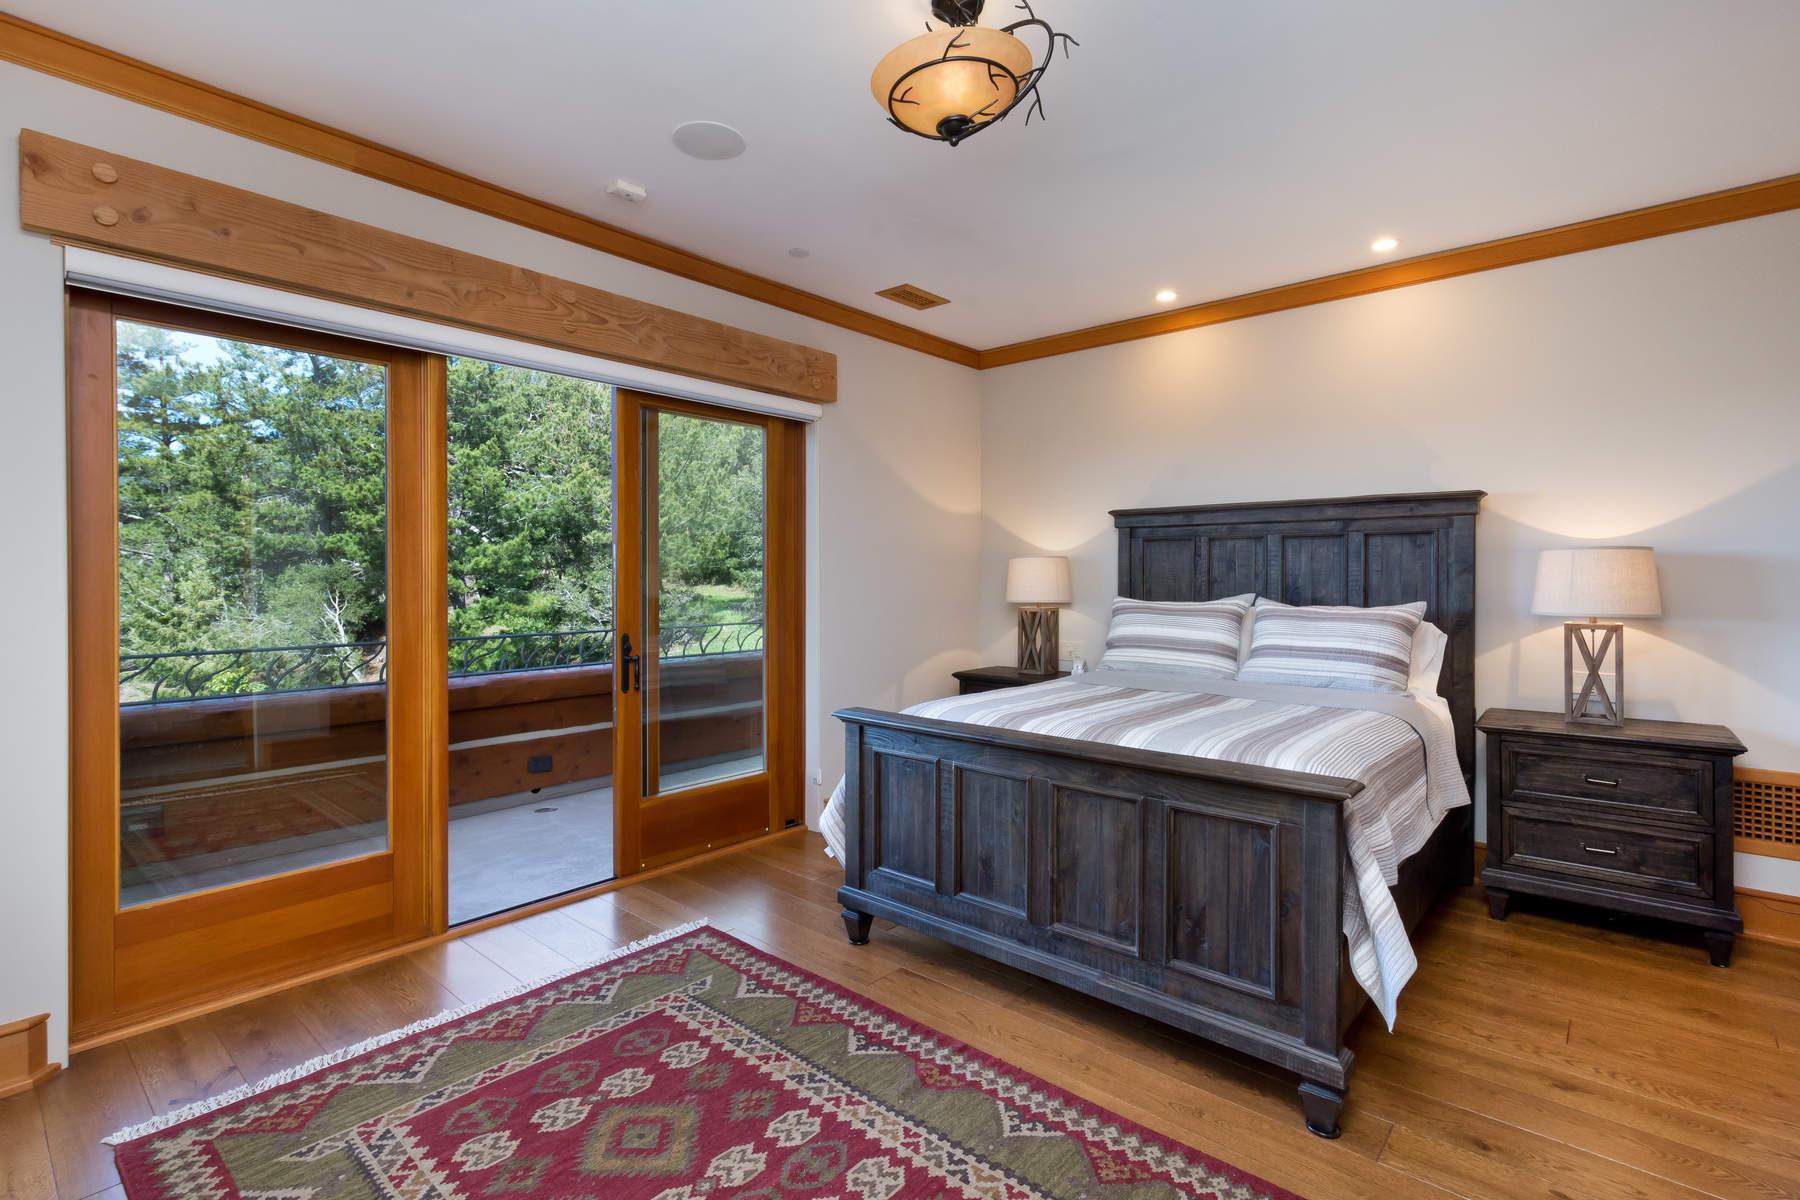 Additional photo for property listing at SF Bay Area Coastal Compound  Pescadero, California 94060 United States